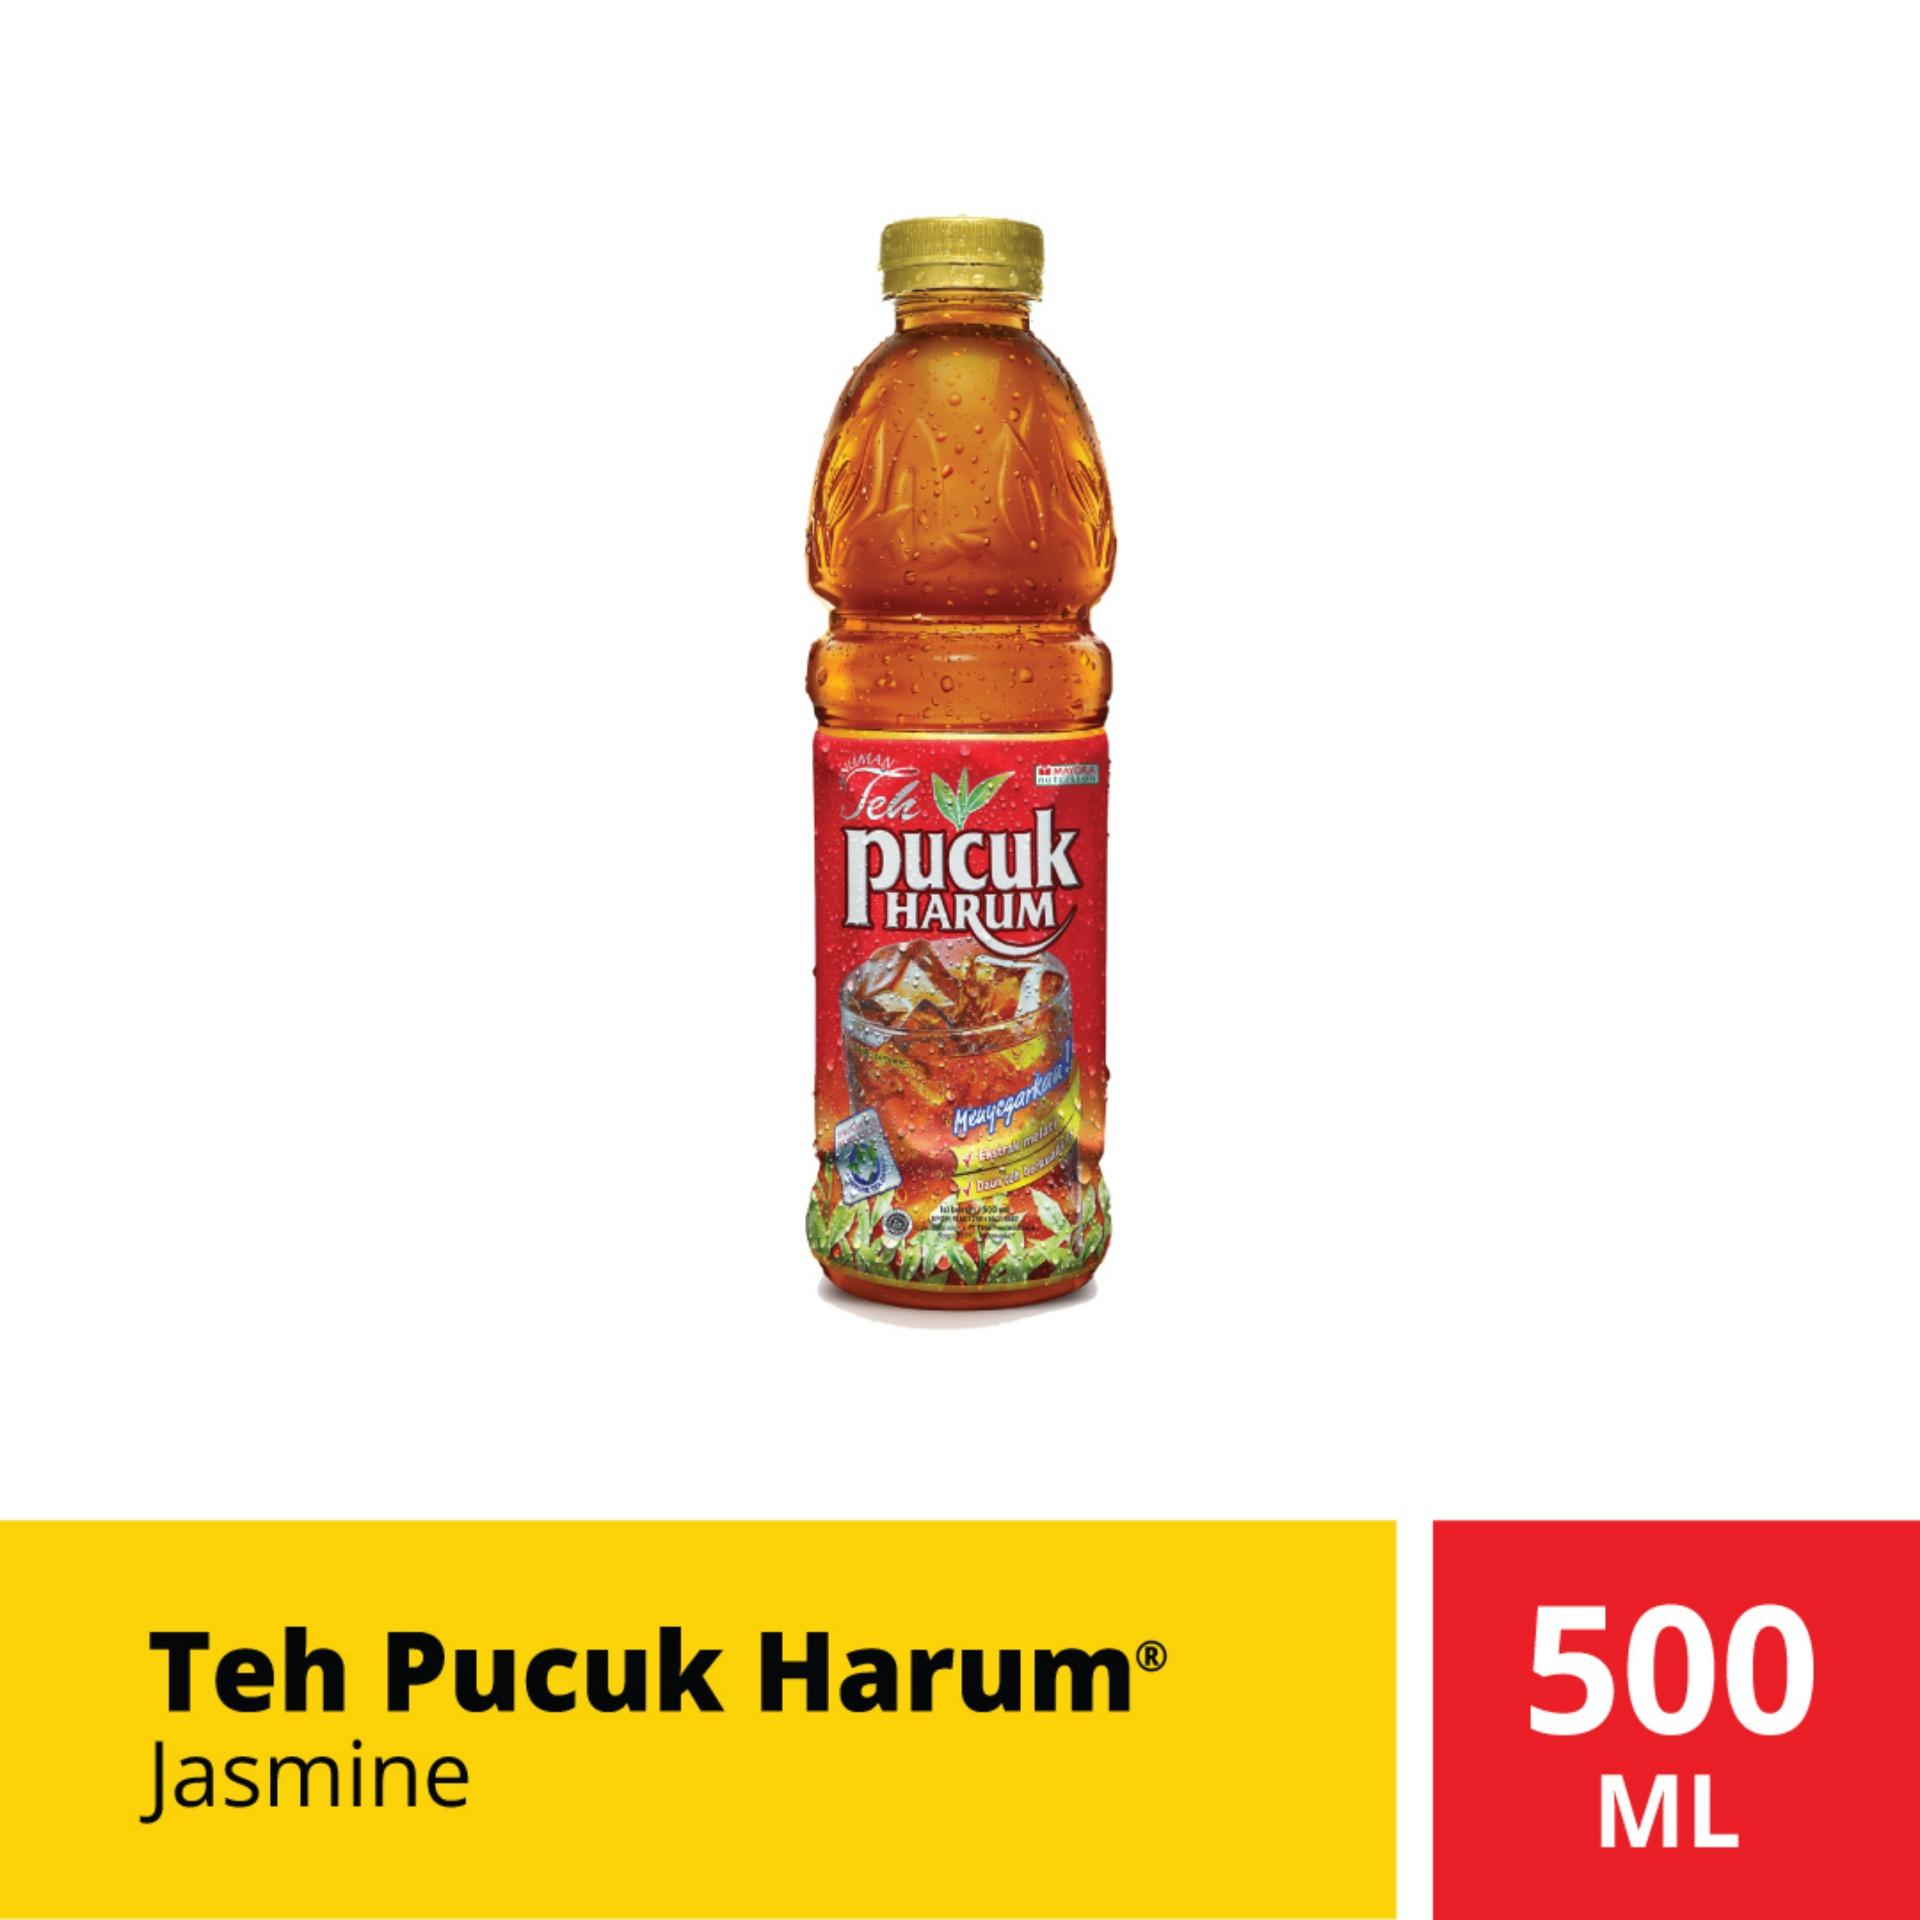 Teh Pucuk Harum Jasmine 500 ml